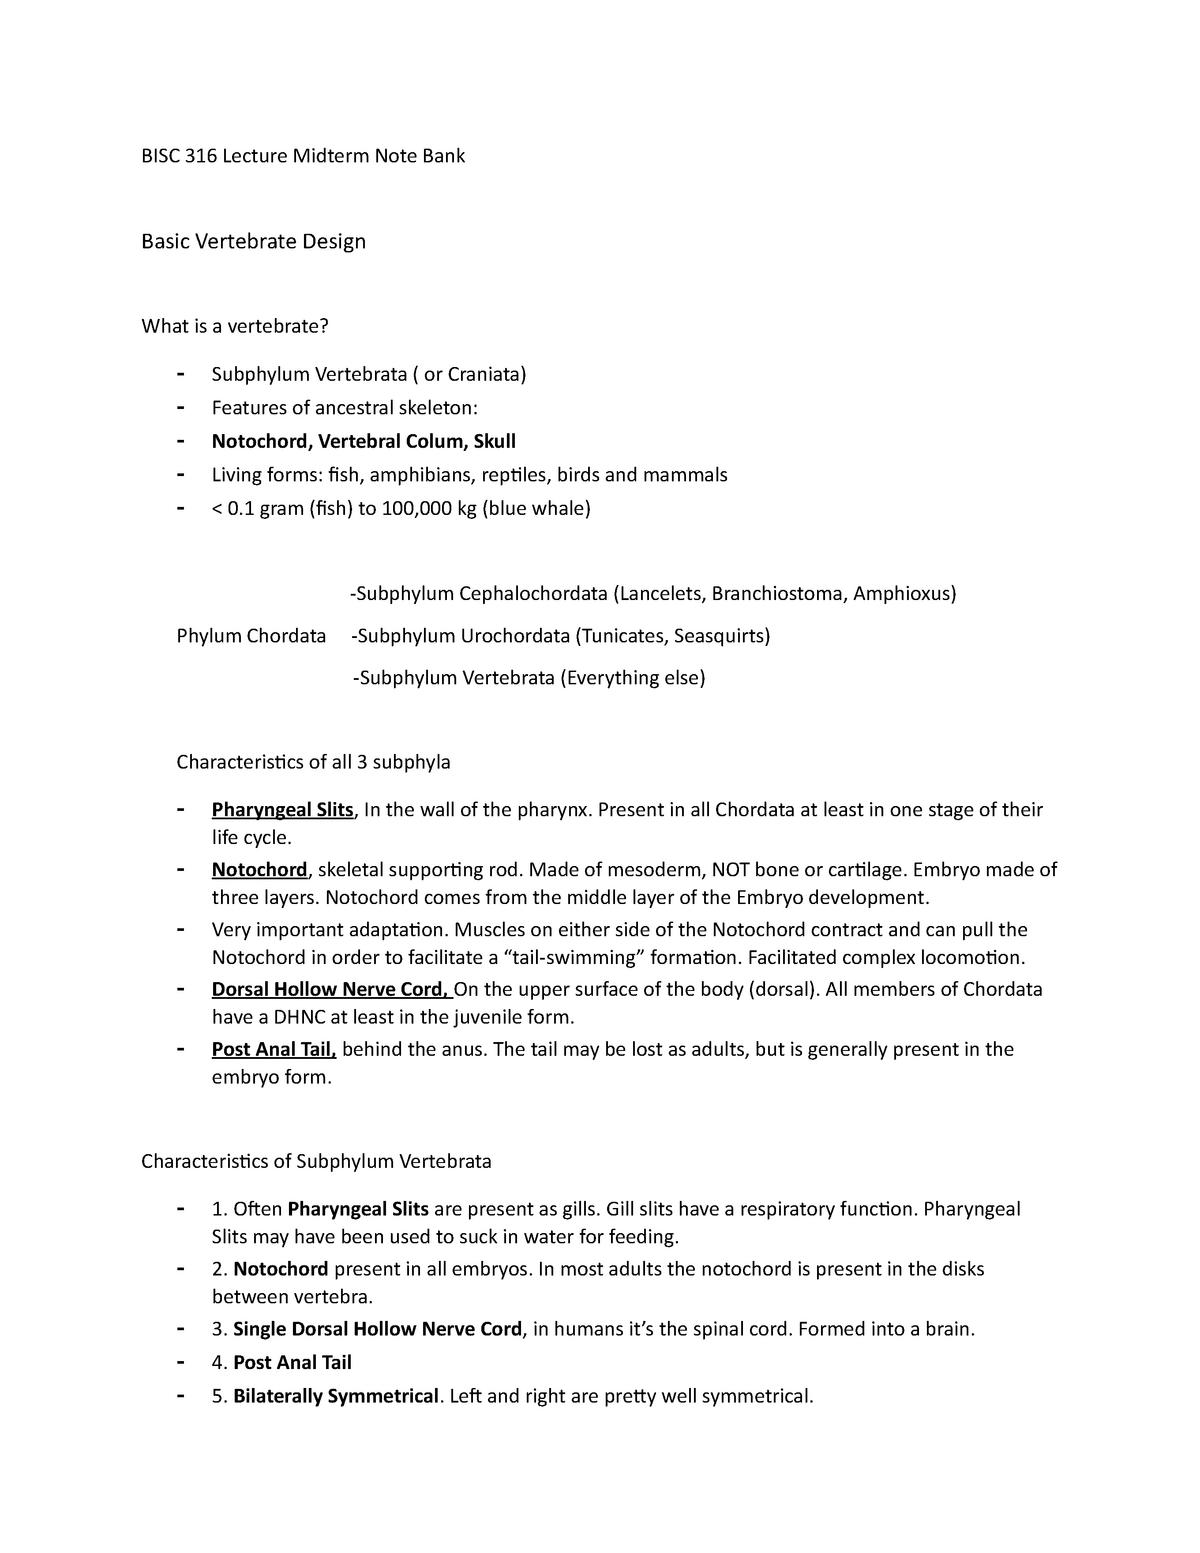 BISC316 Lecture Midterm Note Bank - Bisc 316: Vertebrate Biology